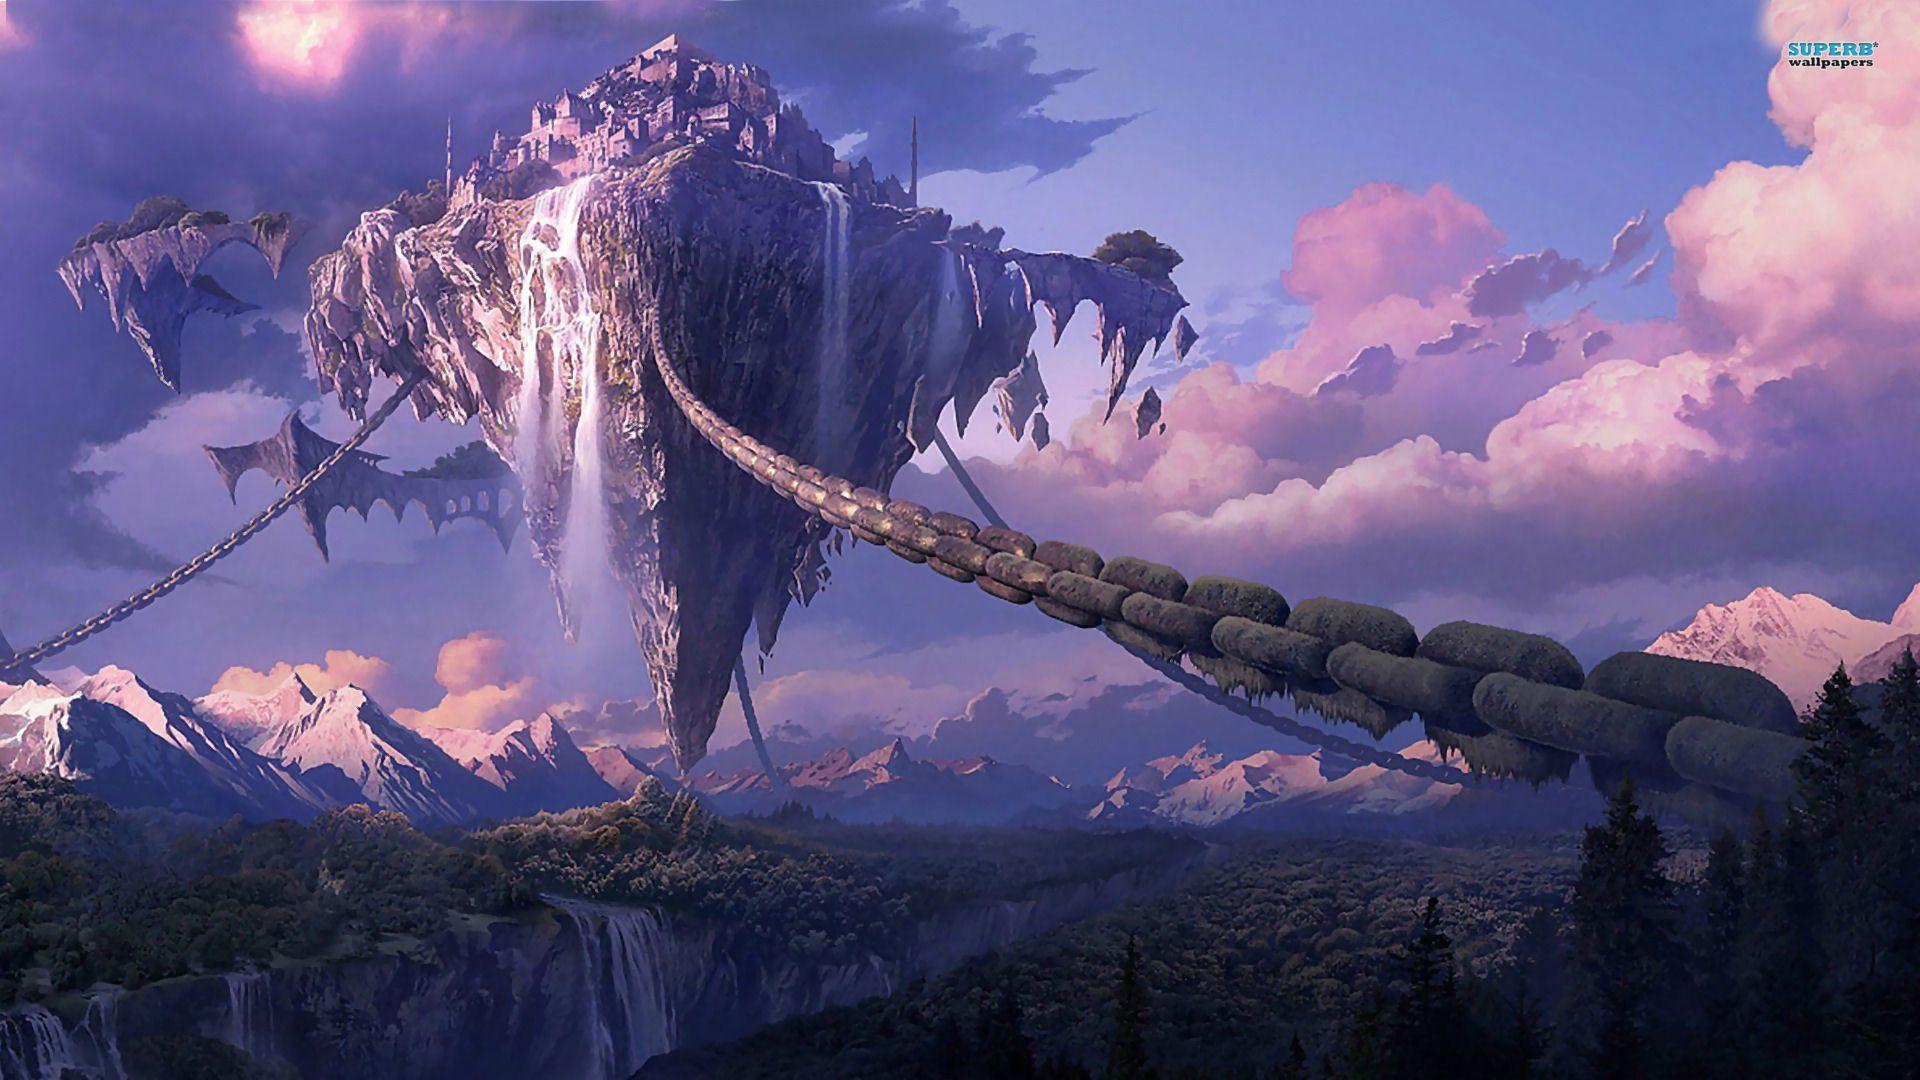 Pin by Sarah Pettinger on Fantasy Art Fantasy landscape